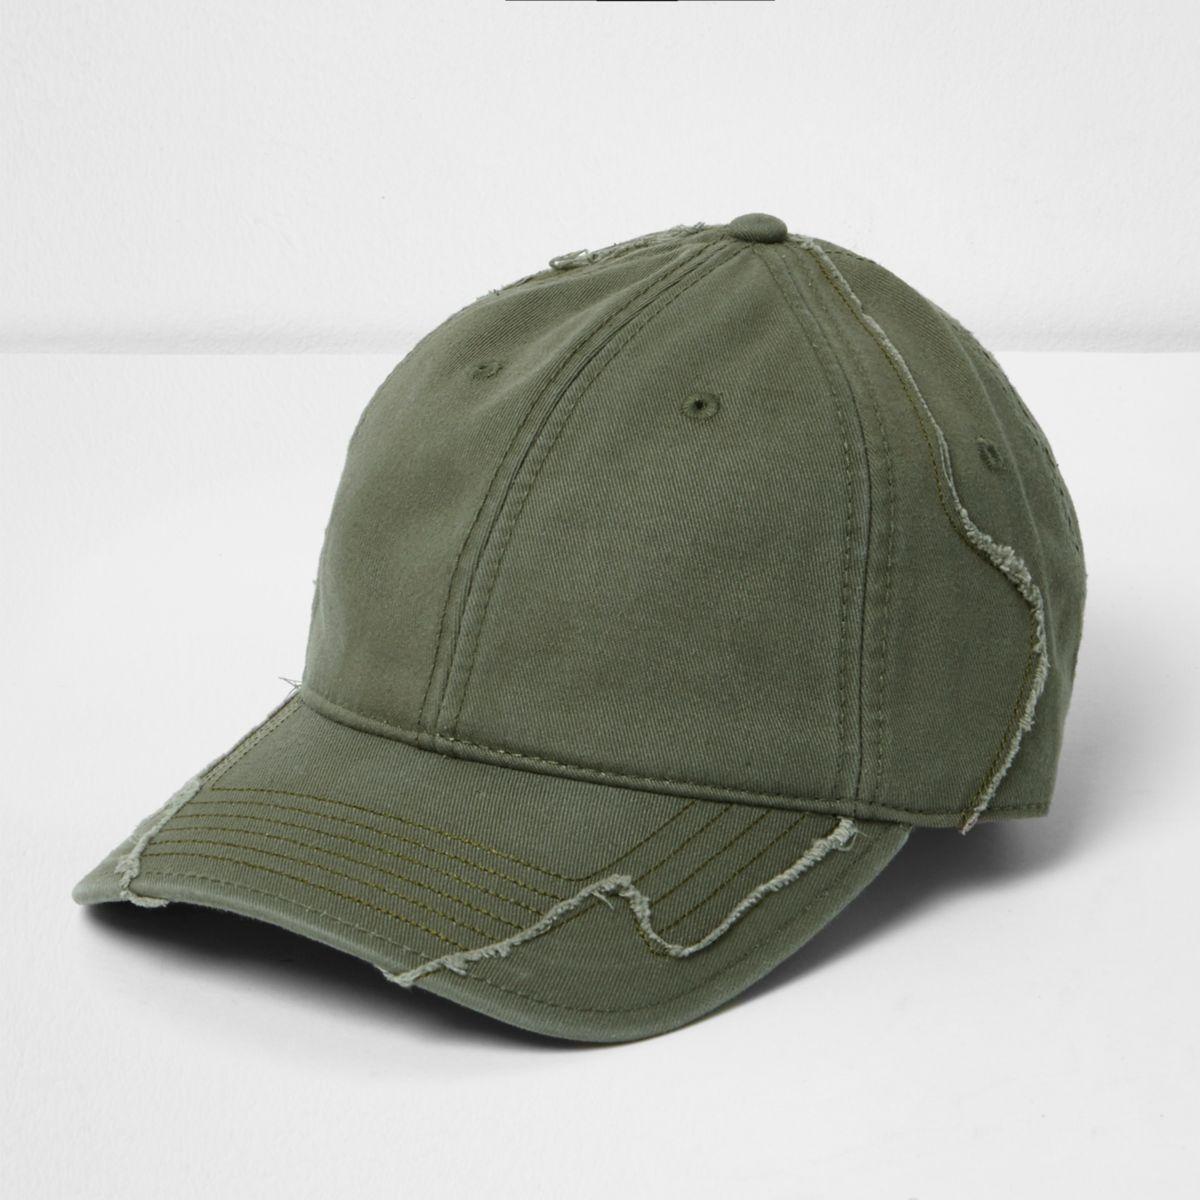 Green distressed baseball cap